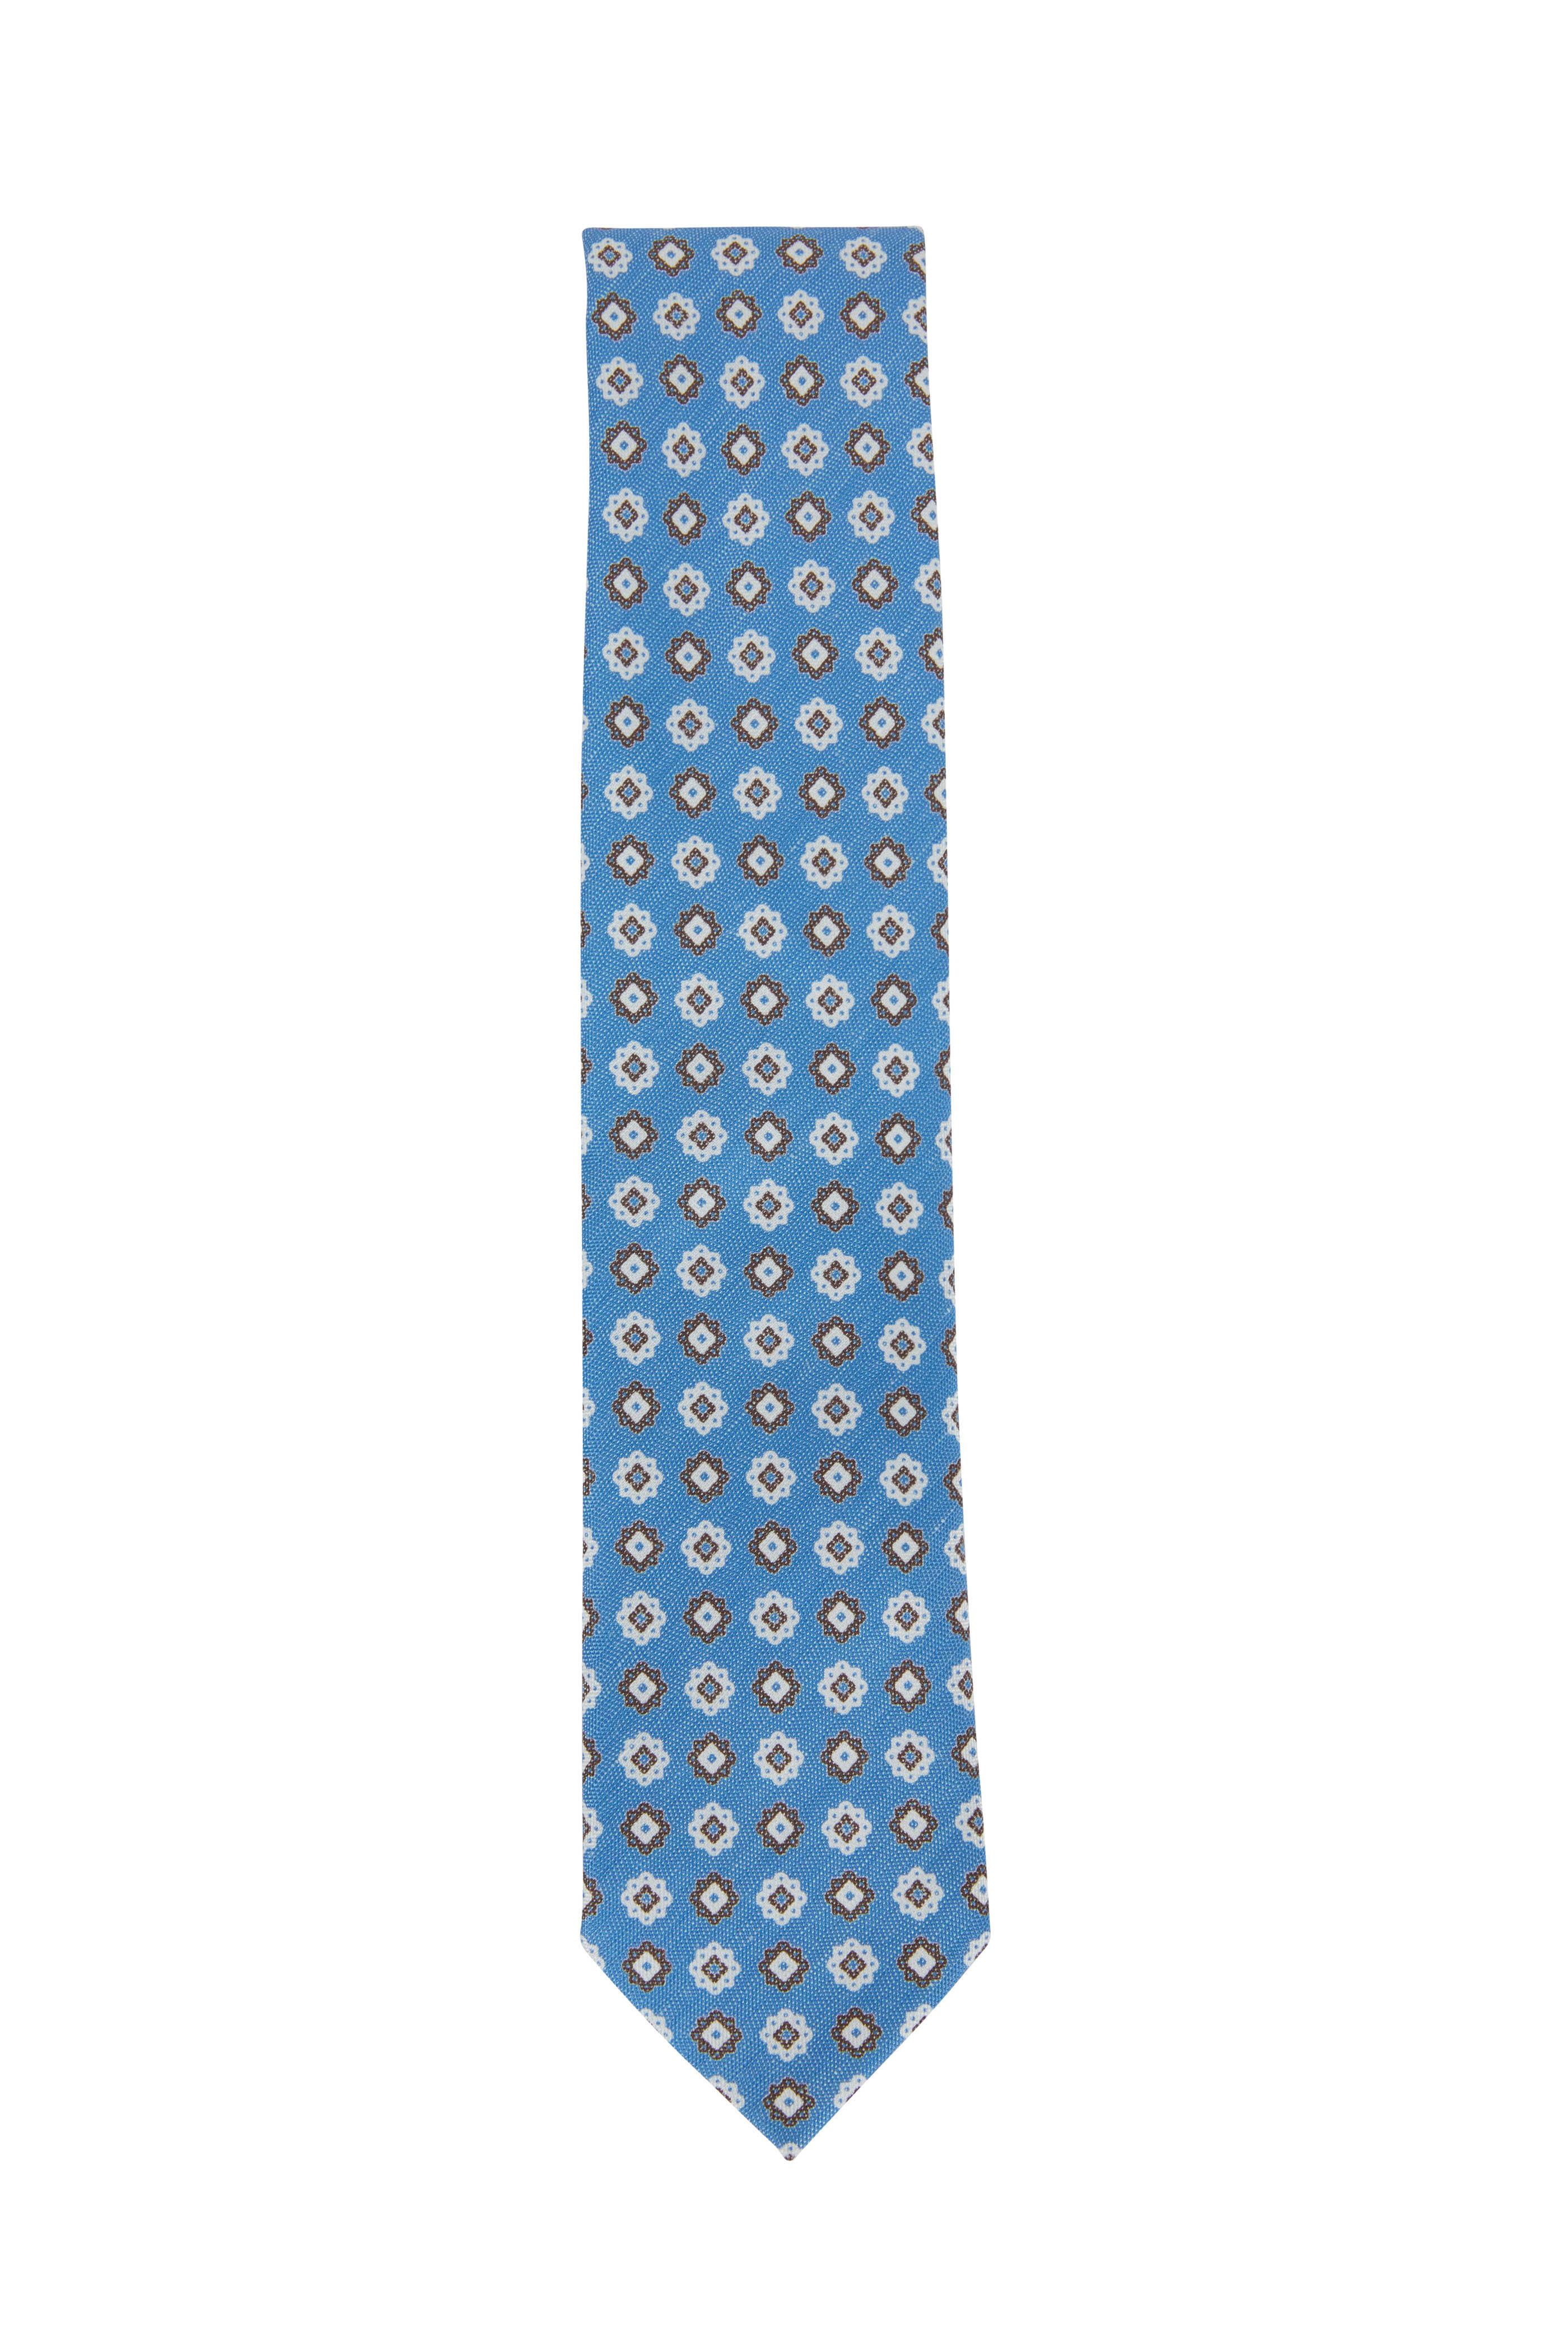 f76ff3a7 Ermenegildo Zegna - Light Blue Floral Printed Silk Blend Necktie ...